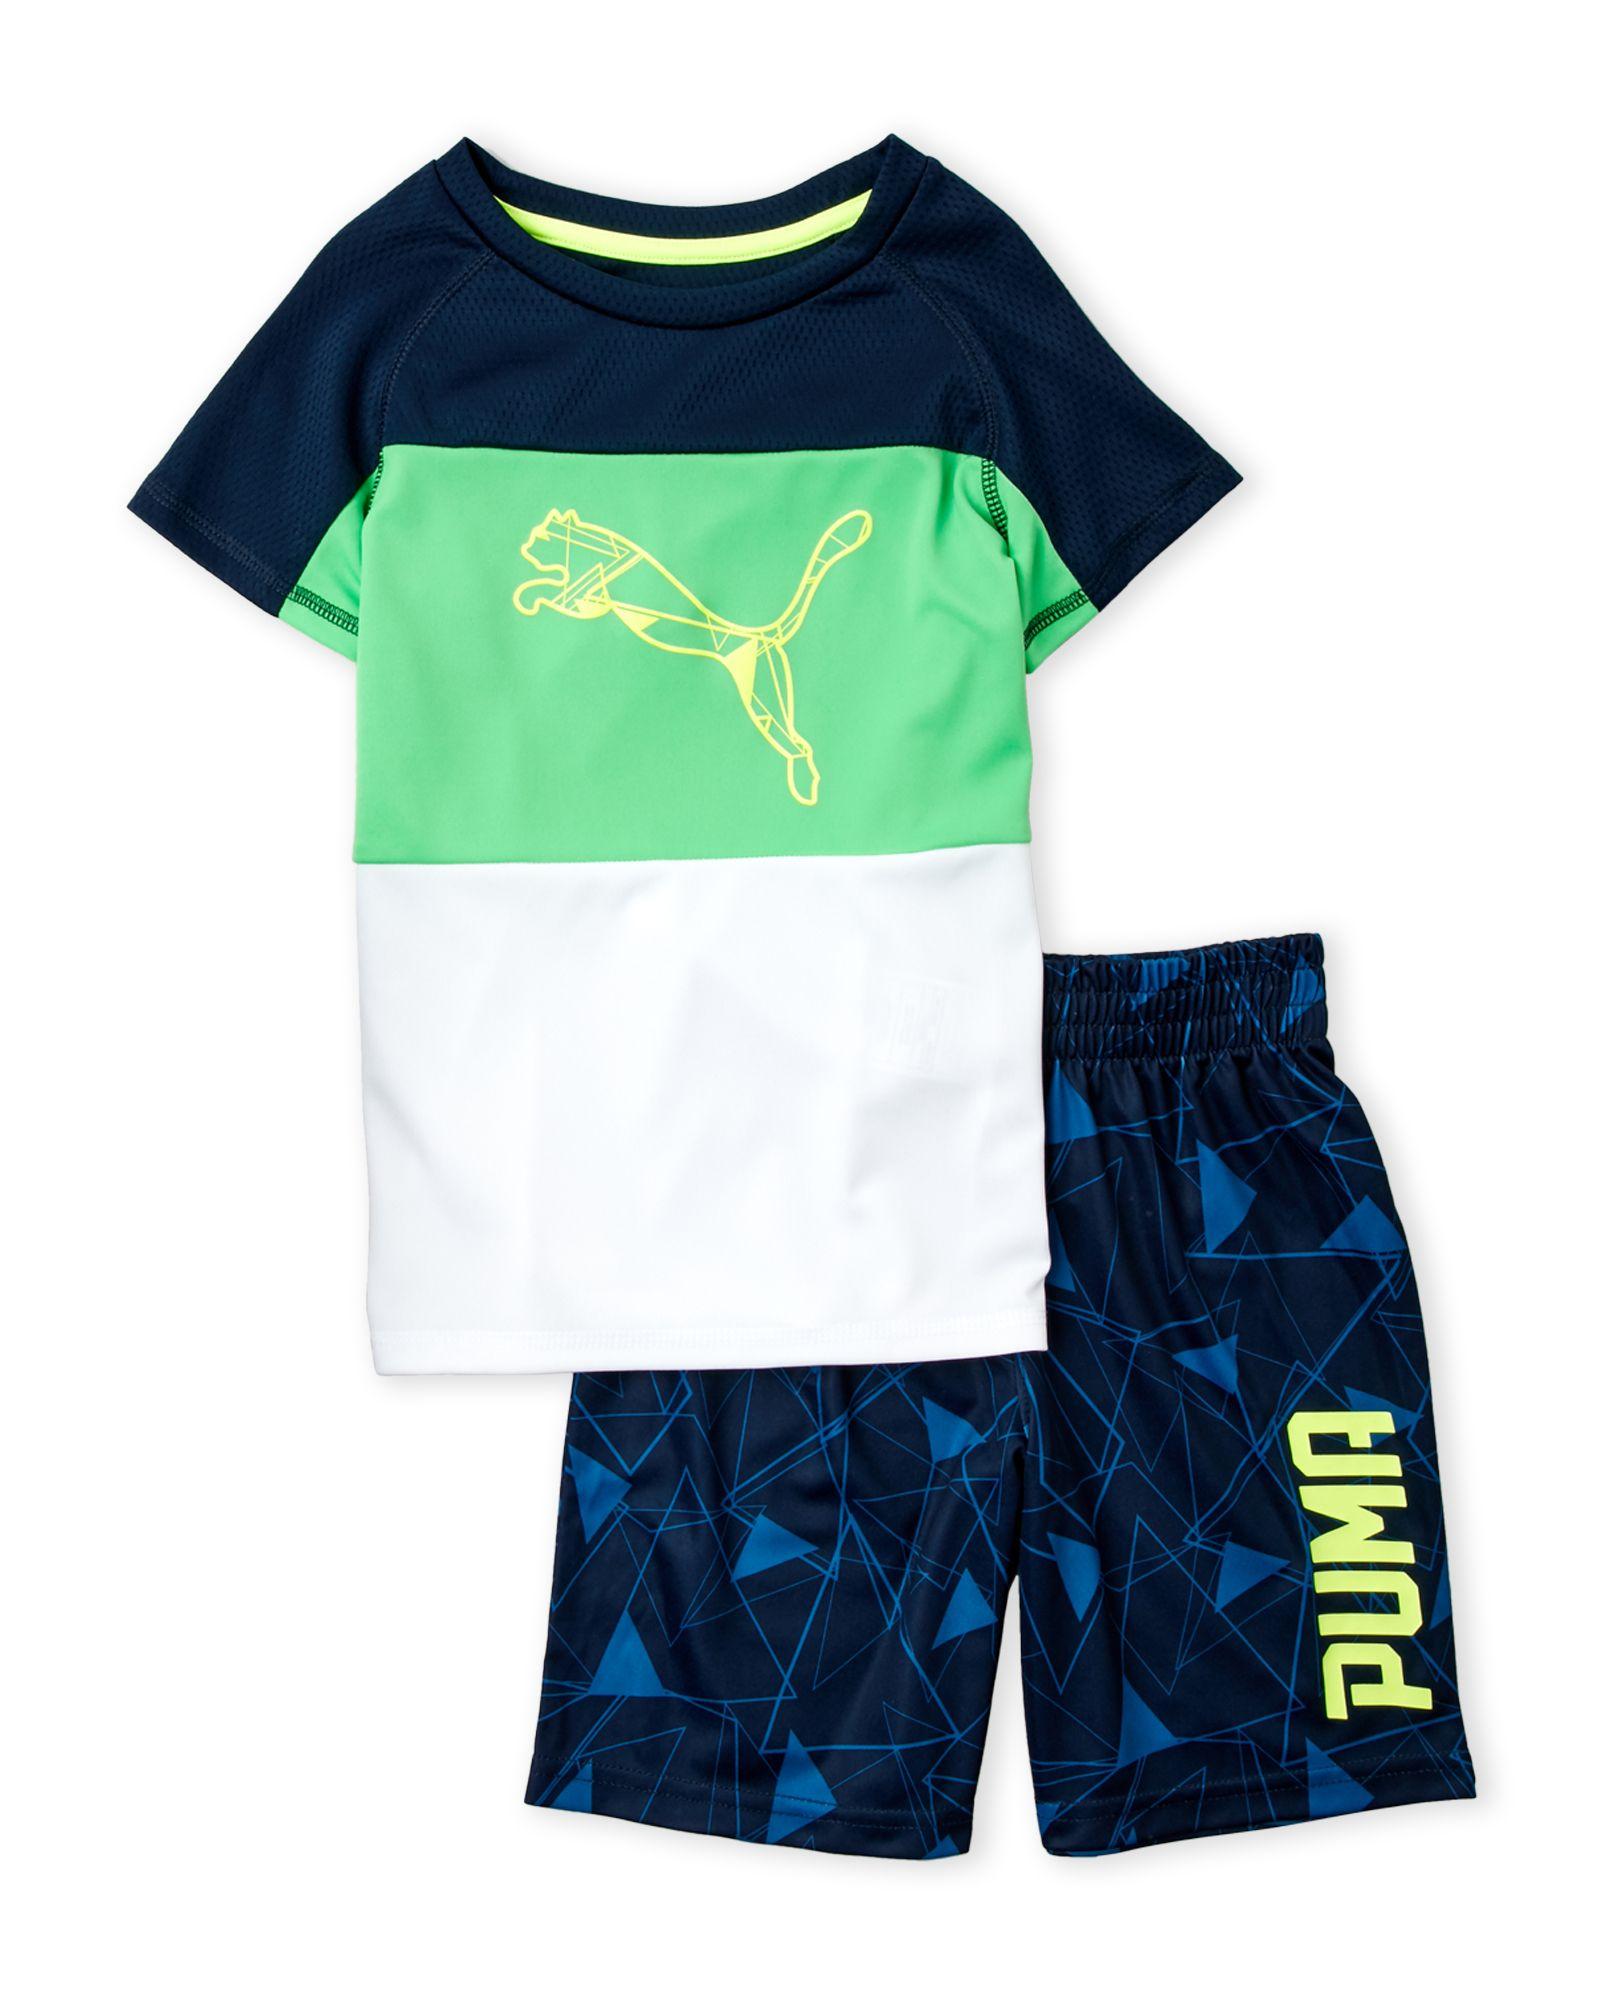 Puma Boys 4 7 2 Piece Color Block Tee & Shorts Set